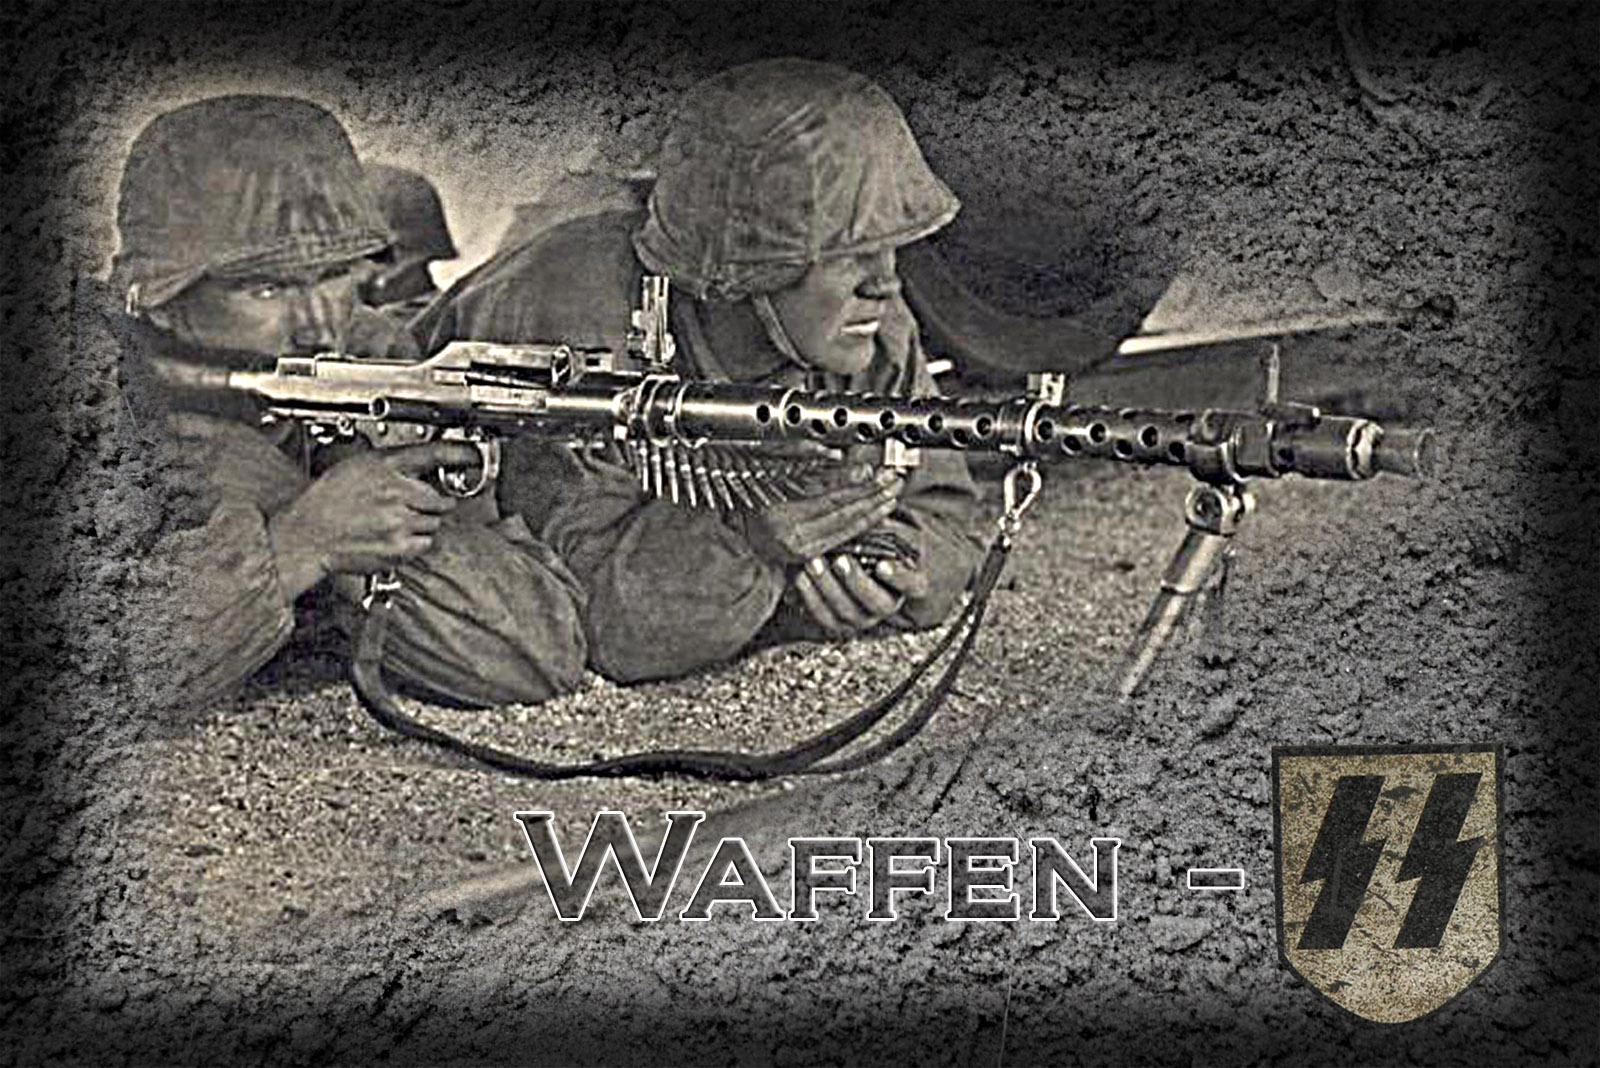 NAZI JERMAN Koleksi Wallpaper Tema Nazi Jerman 1600x1068